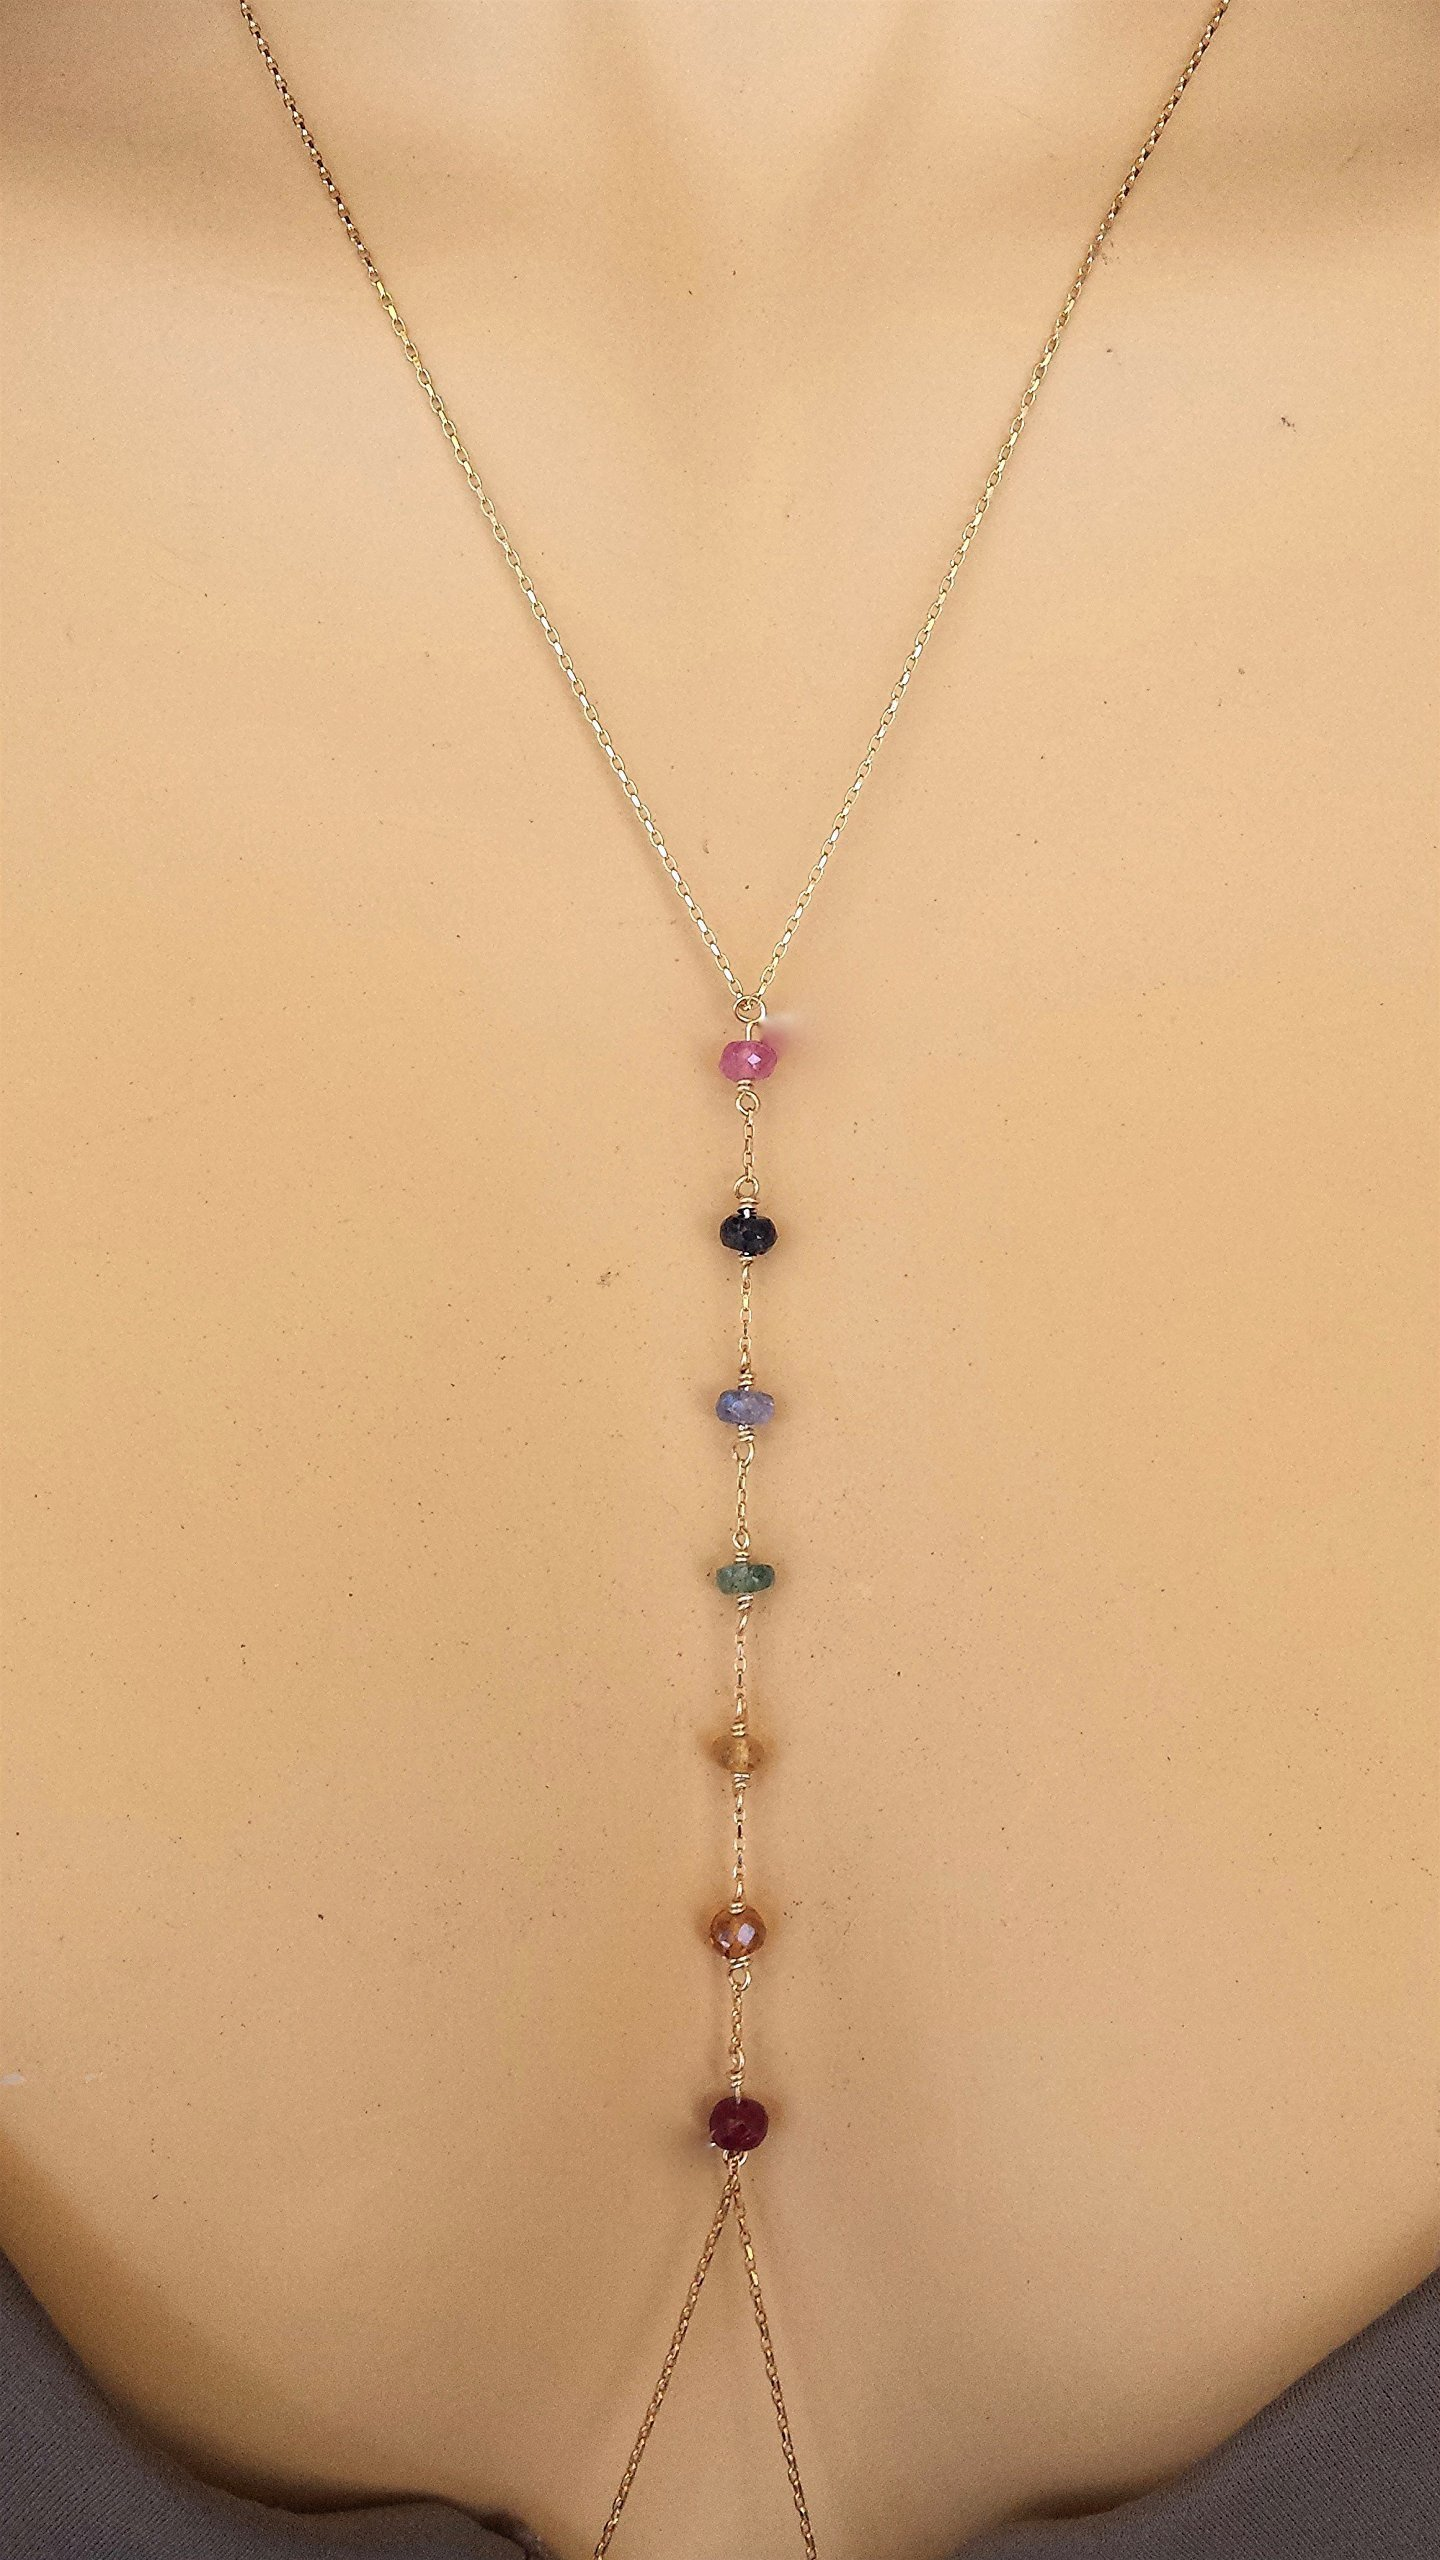 7 Chakras Jewelry Precious Stones Non Tarnish Body Necklace Gift for Her Spiritual Yoga